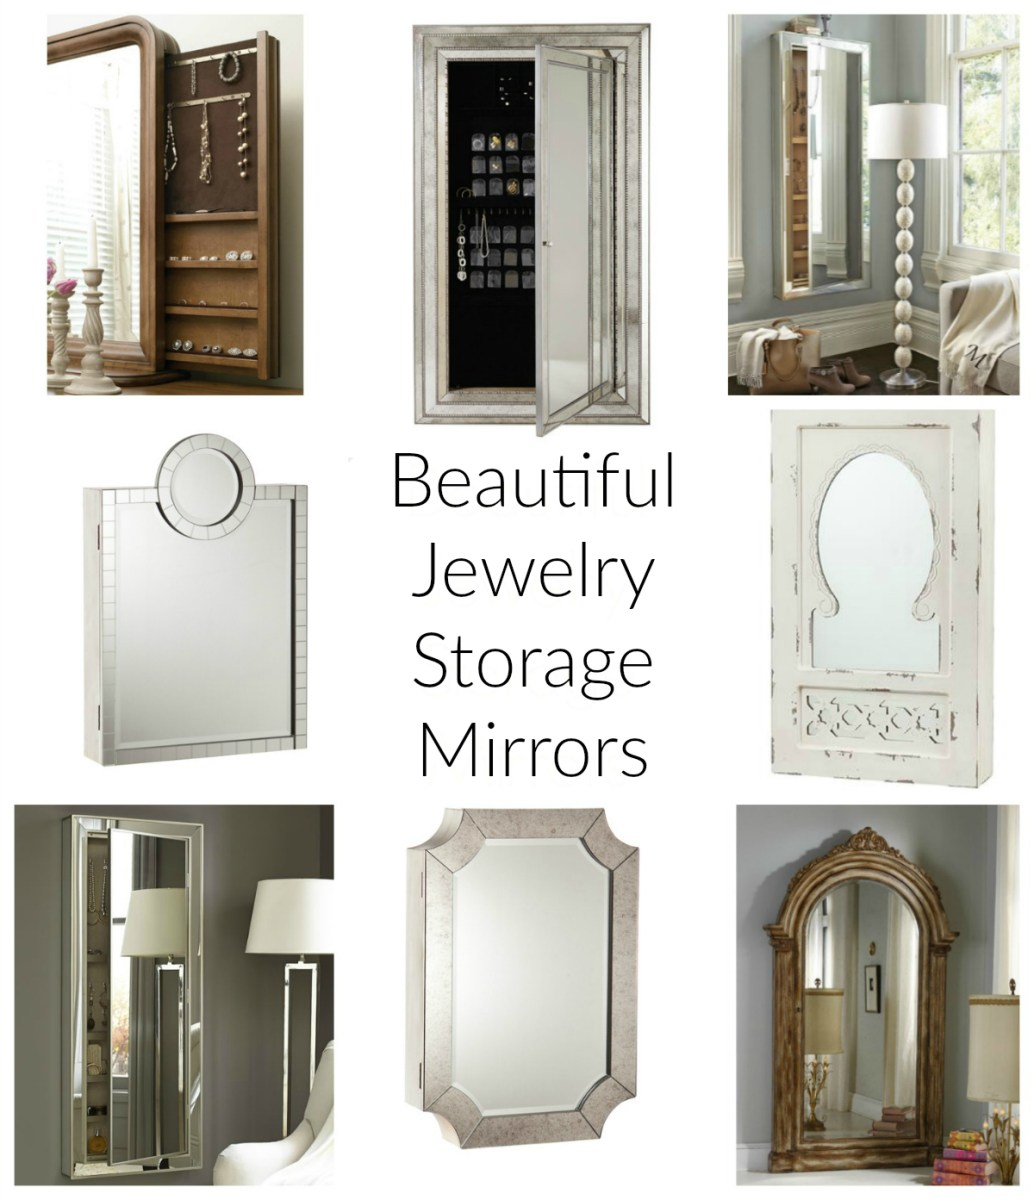 Jewelry Storage Mirrors